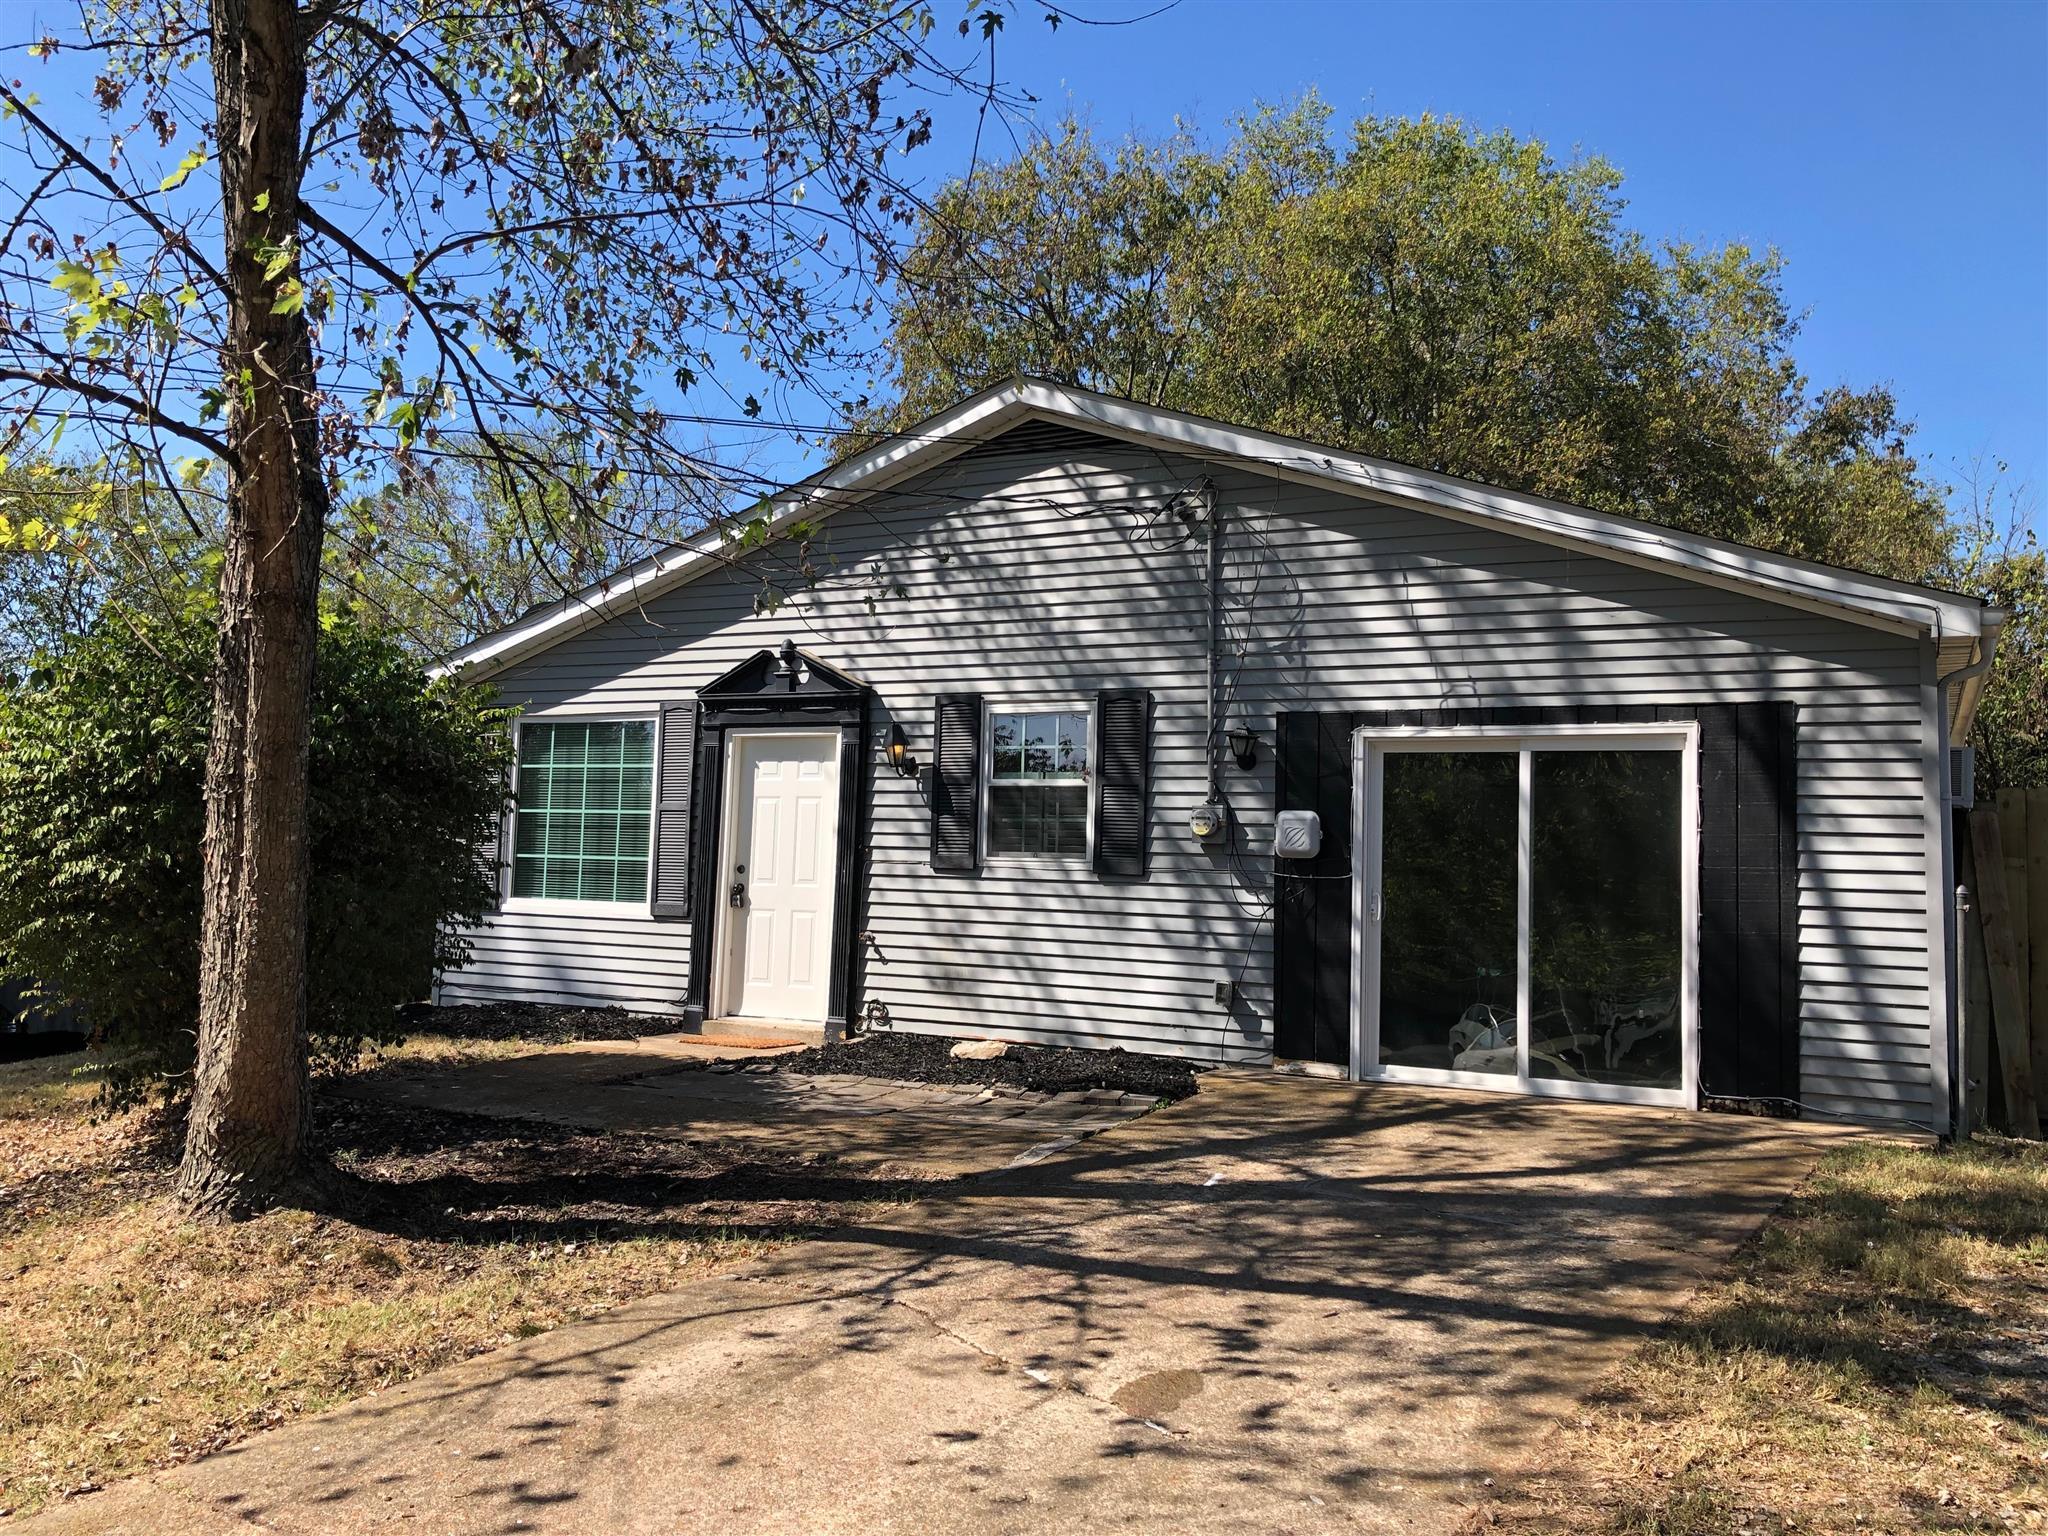 1000 Cheyenne Blvd, Madison, TN 37115 - Madison, TN real estate listing